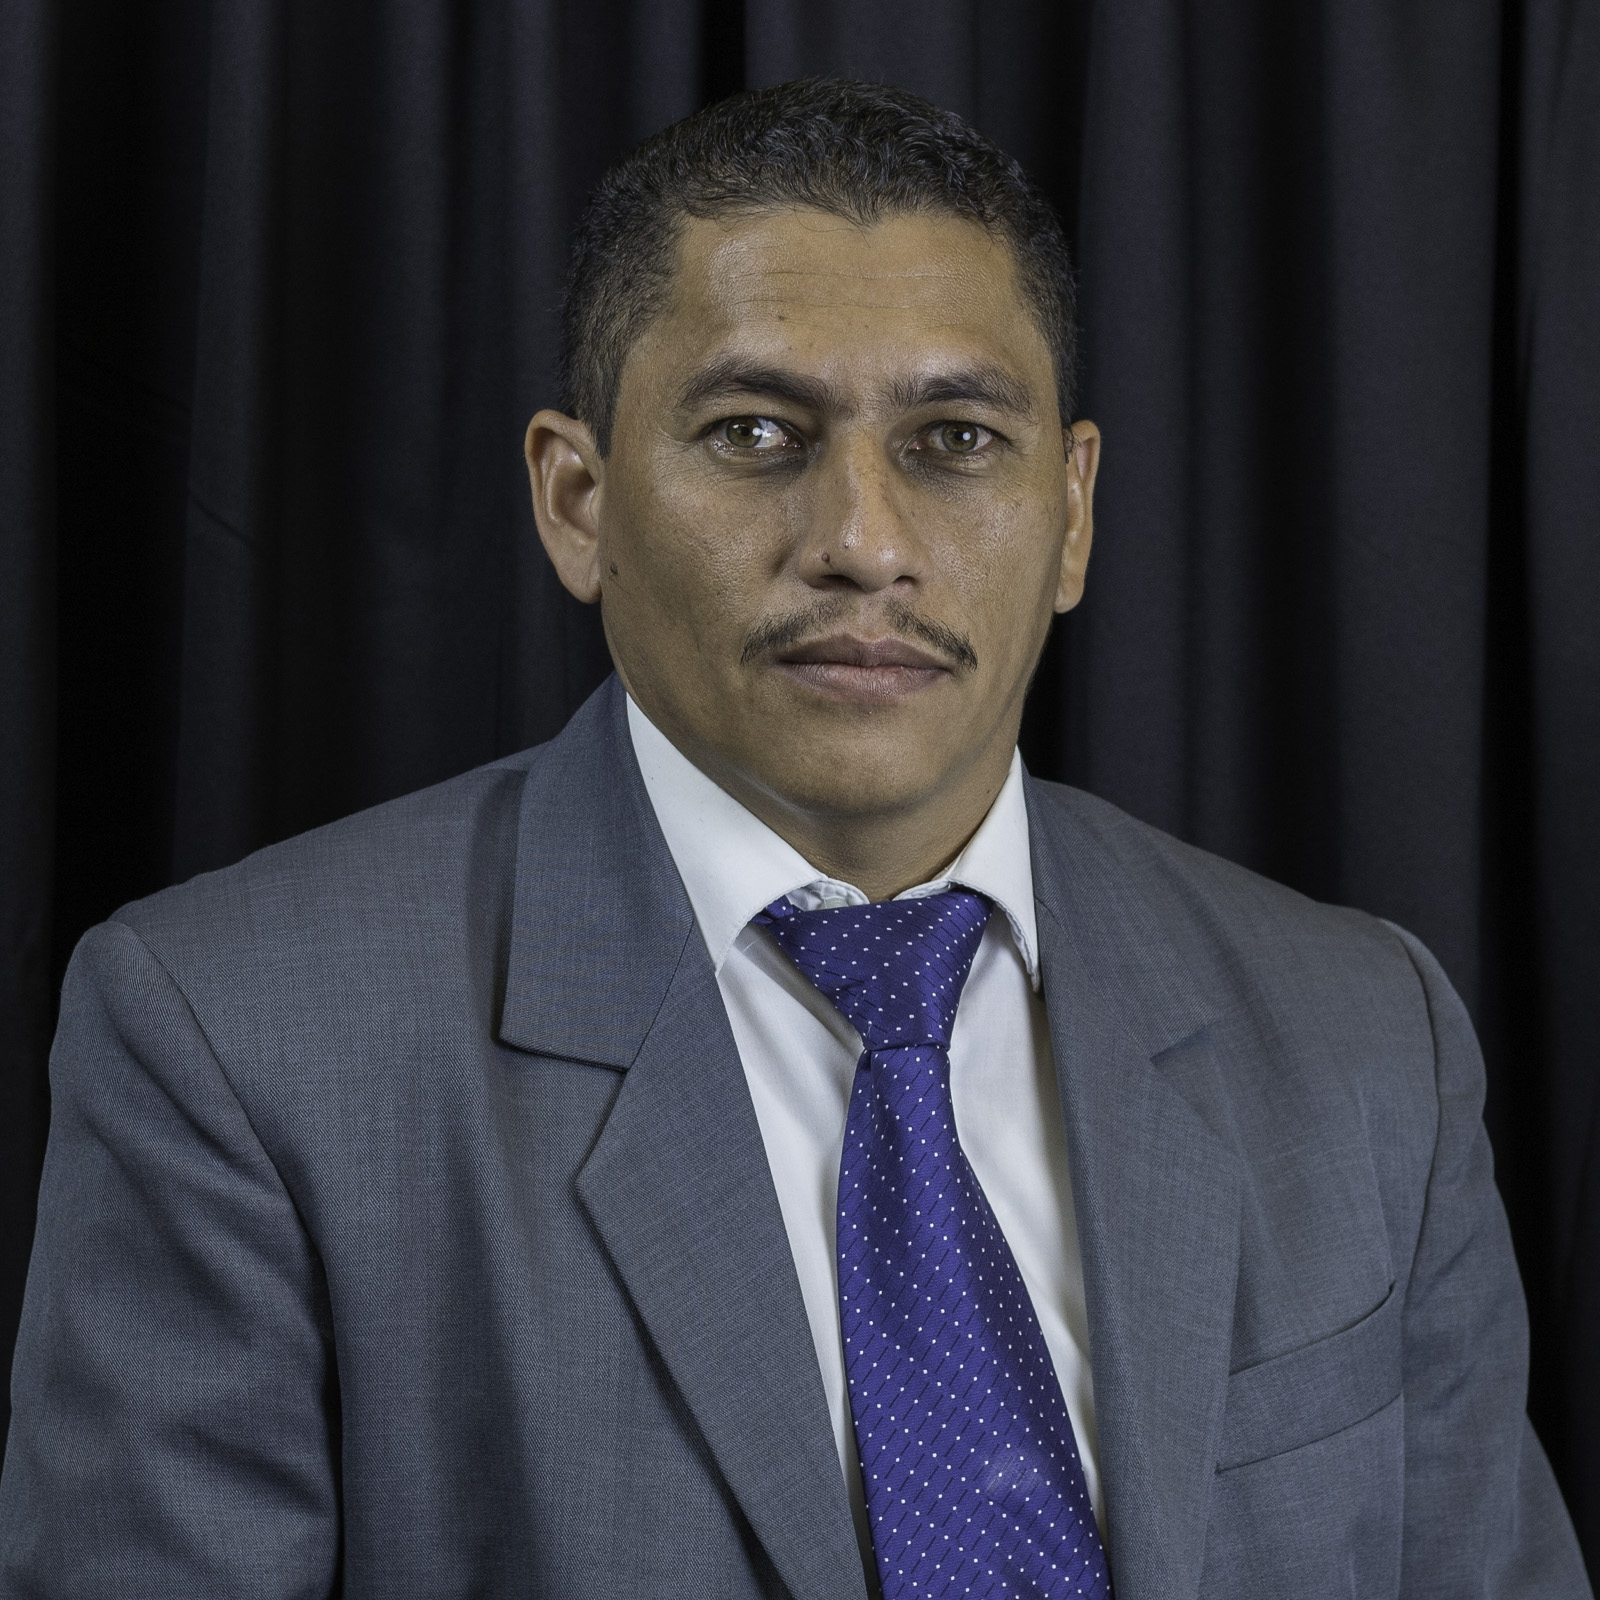 Julio Cesar Cruz Santos